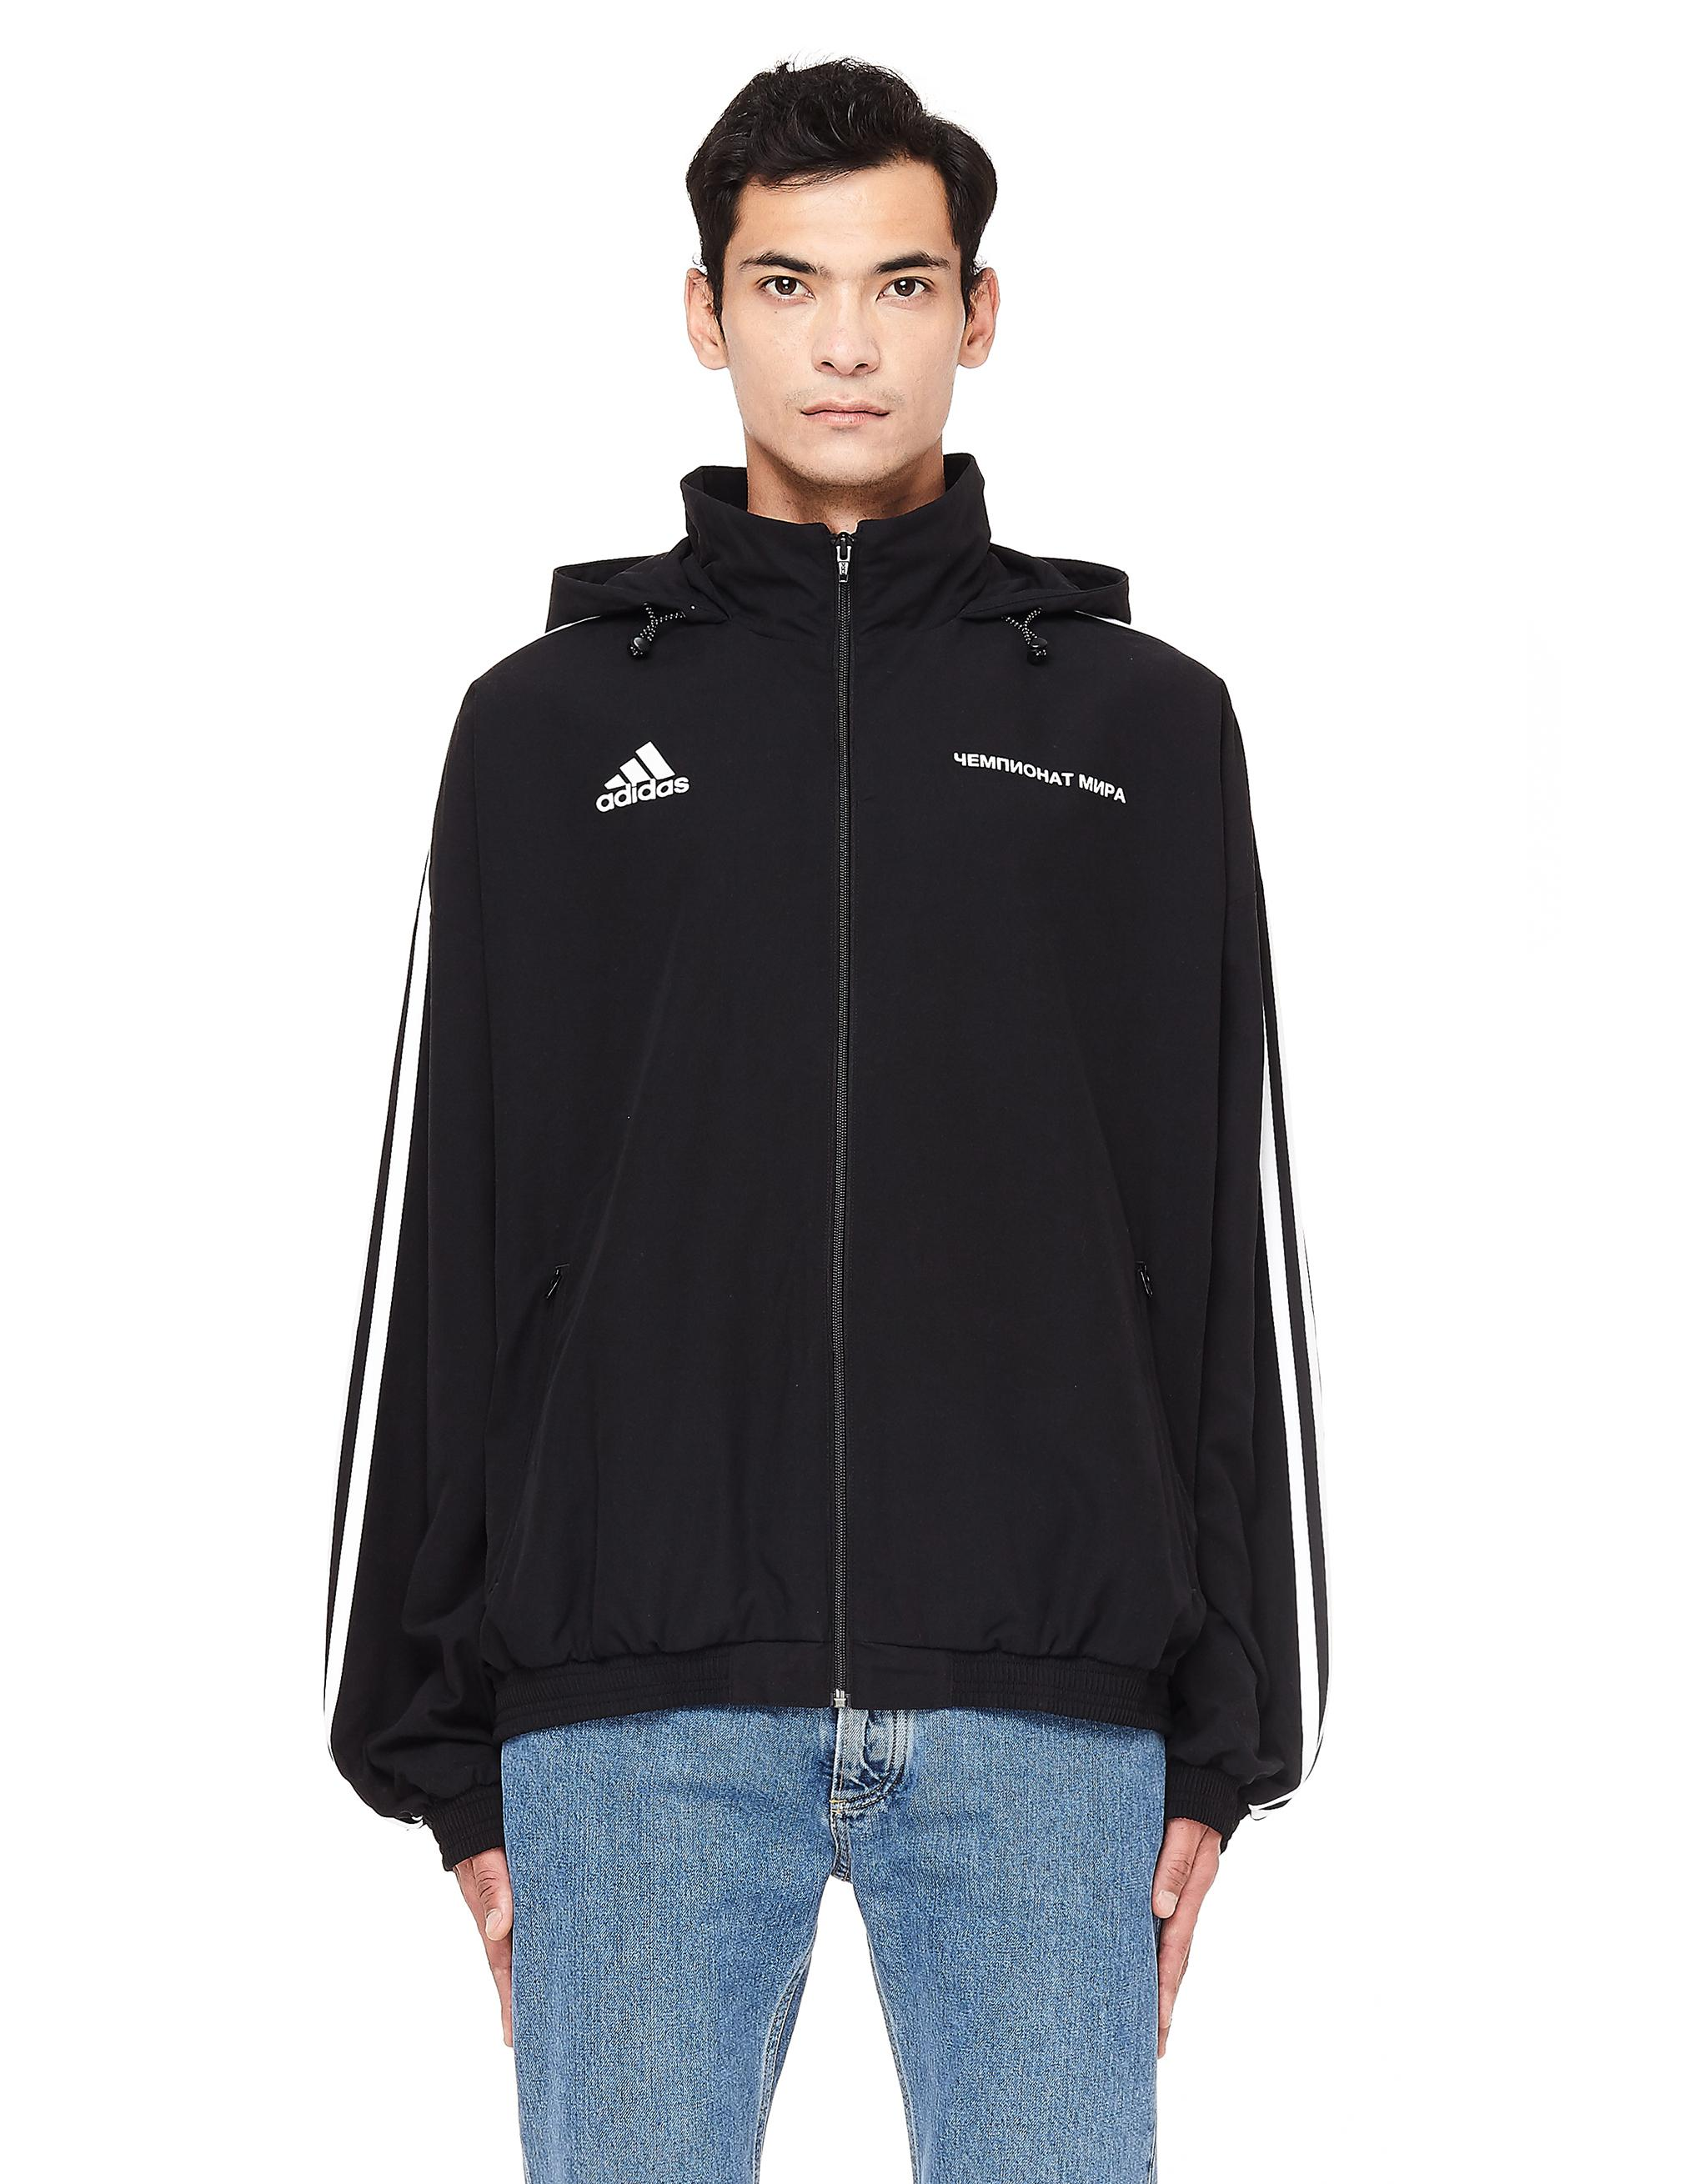 bd5fb9f0 Gosha Rubchinskiy Black Hooded Adidas Track Jacket in Black for Men ...